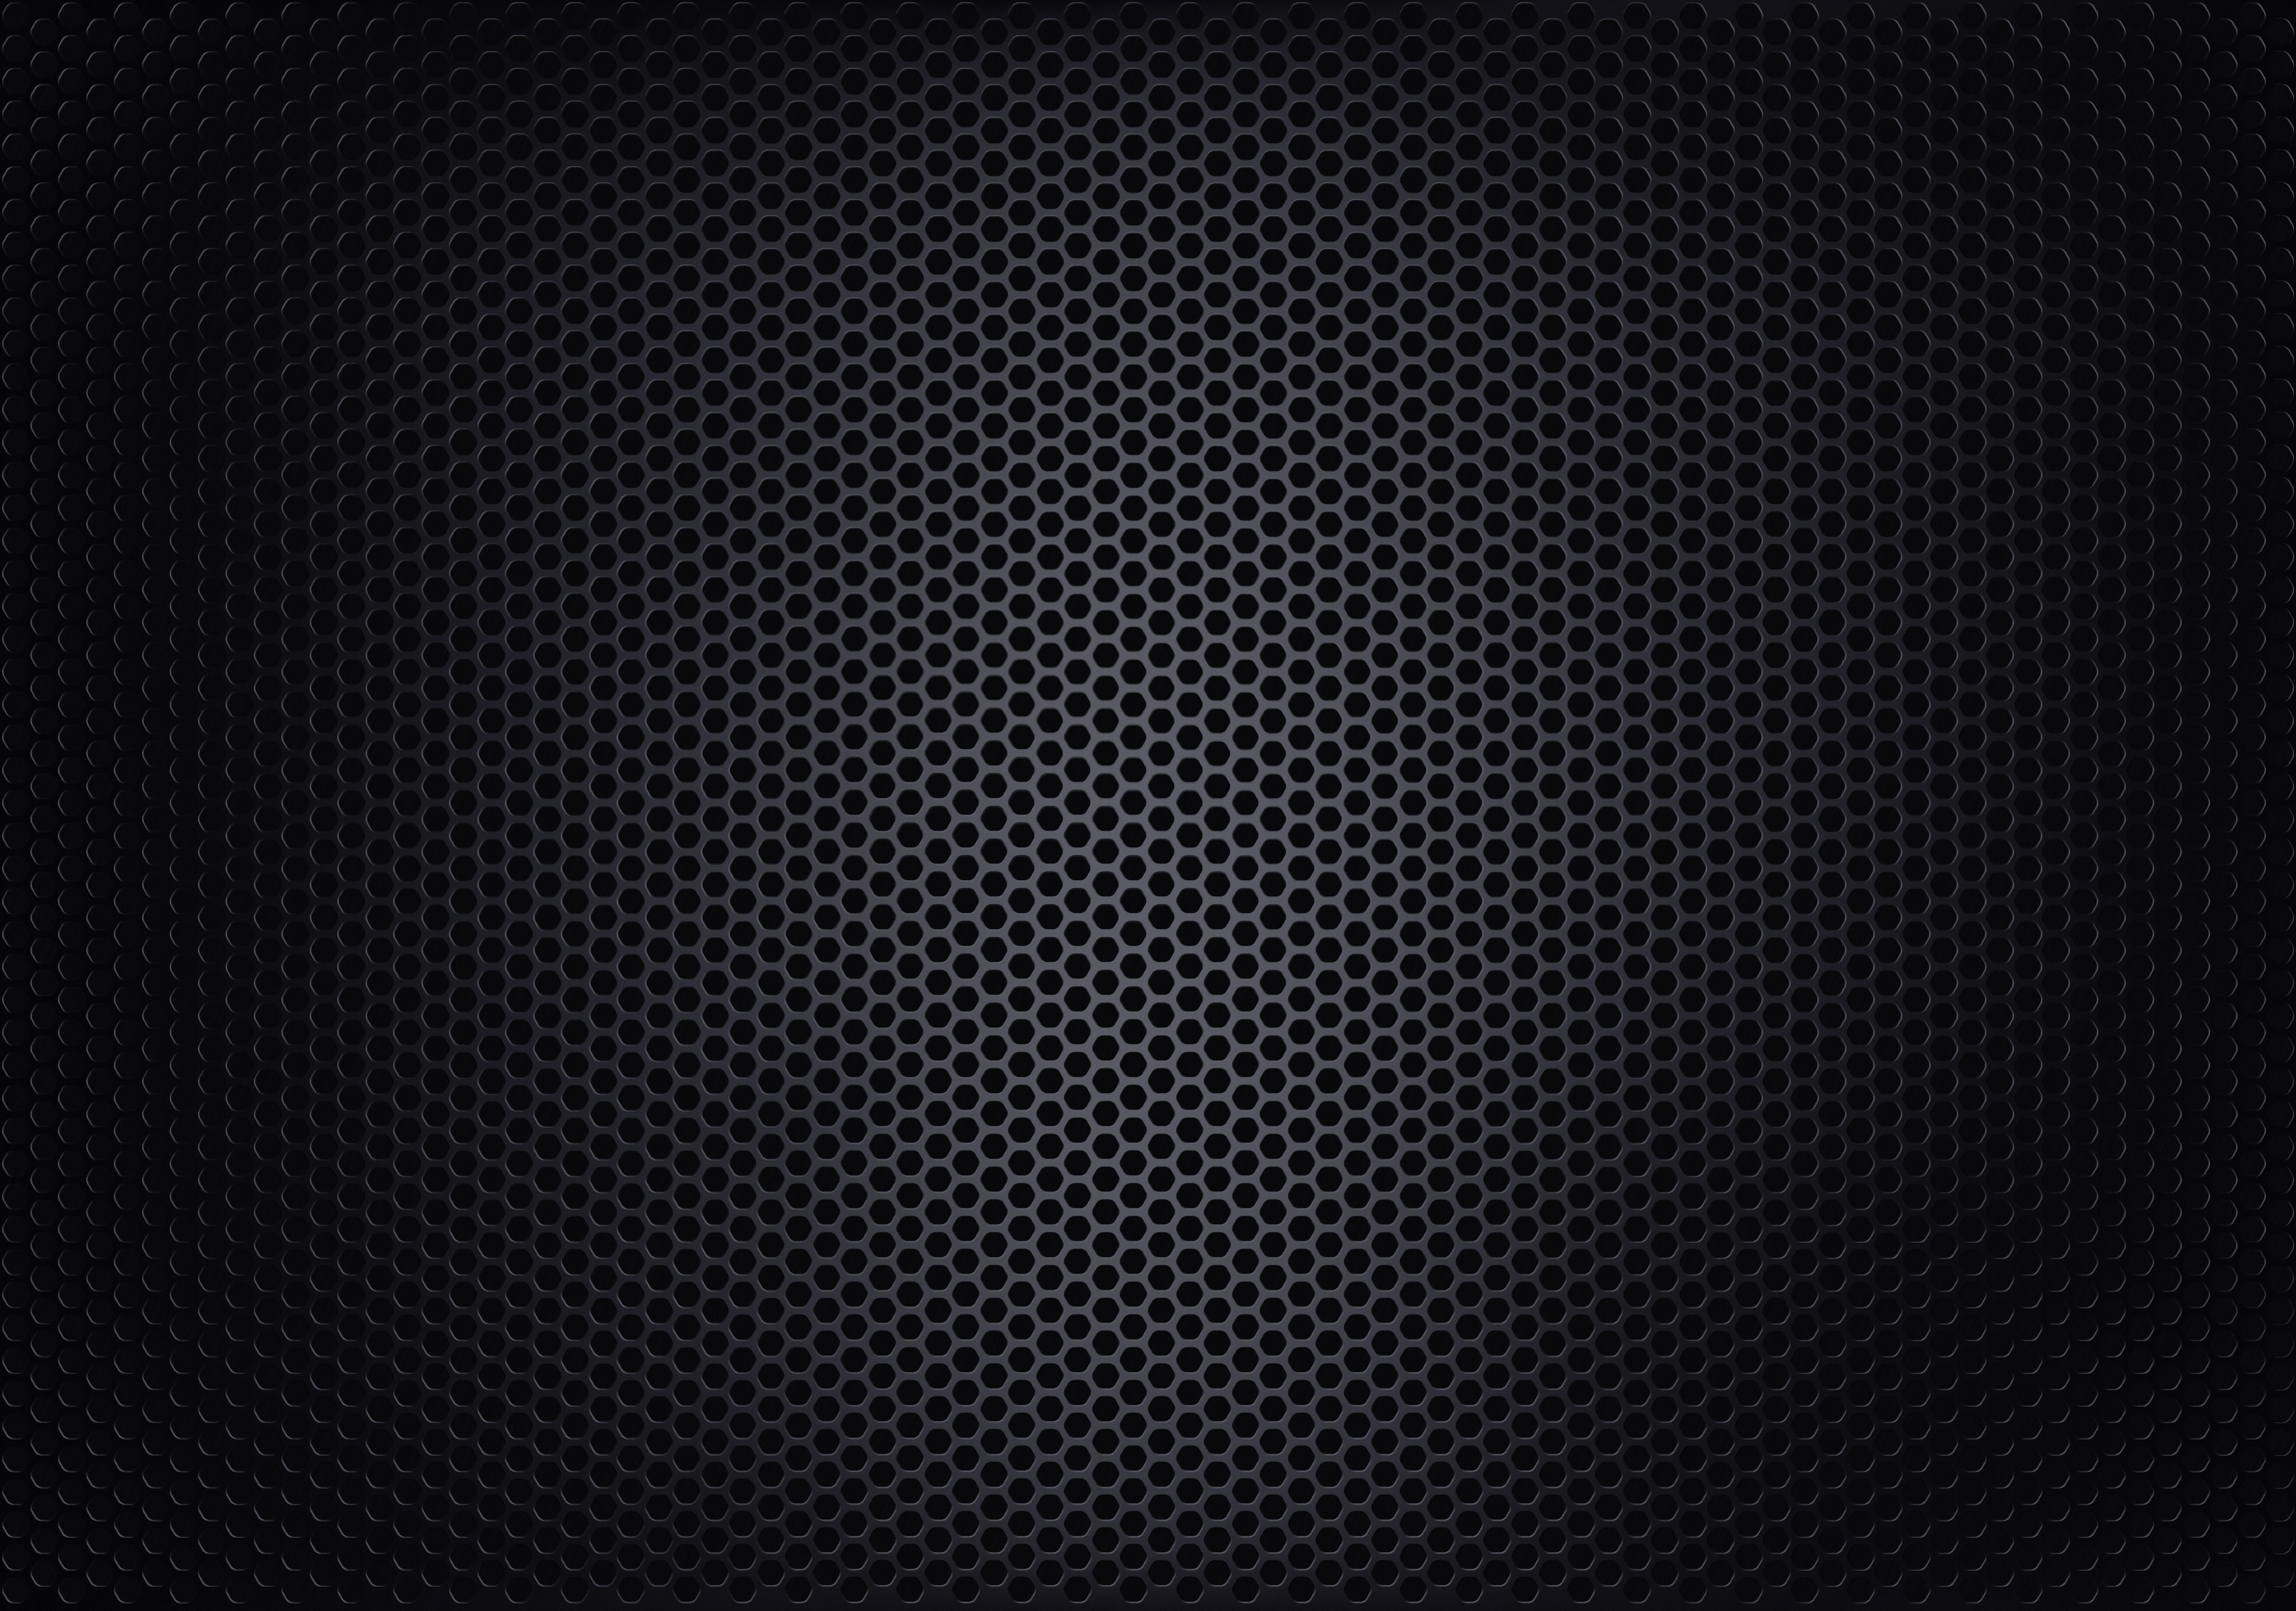 Black mesh wordpress background1jpg 6298x4418